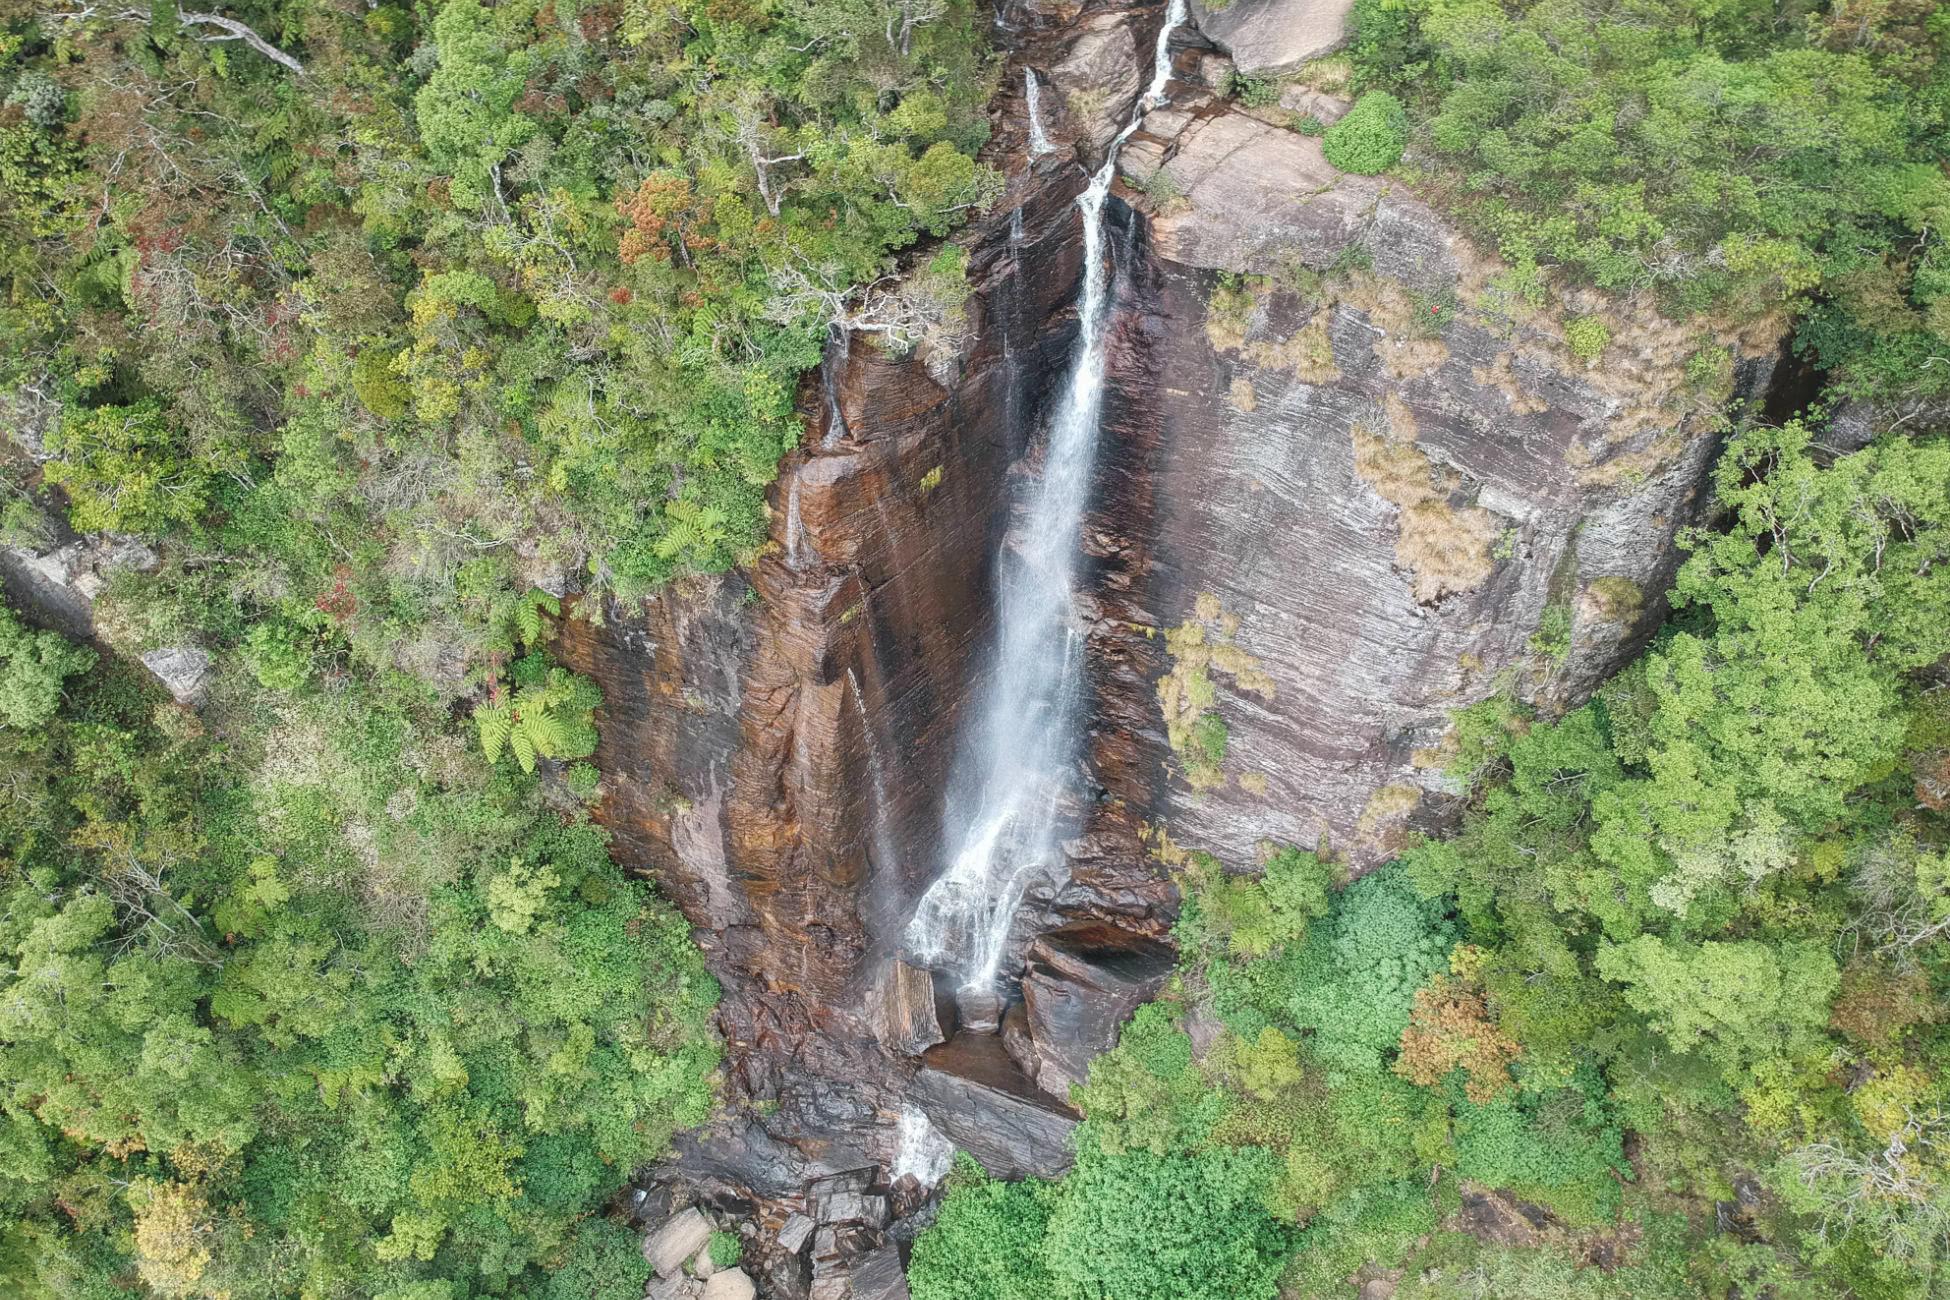 Lover's Leap Wasserfall in Nuwara Eliya